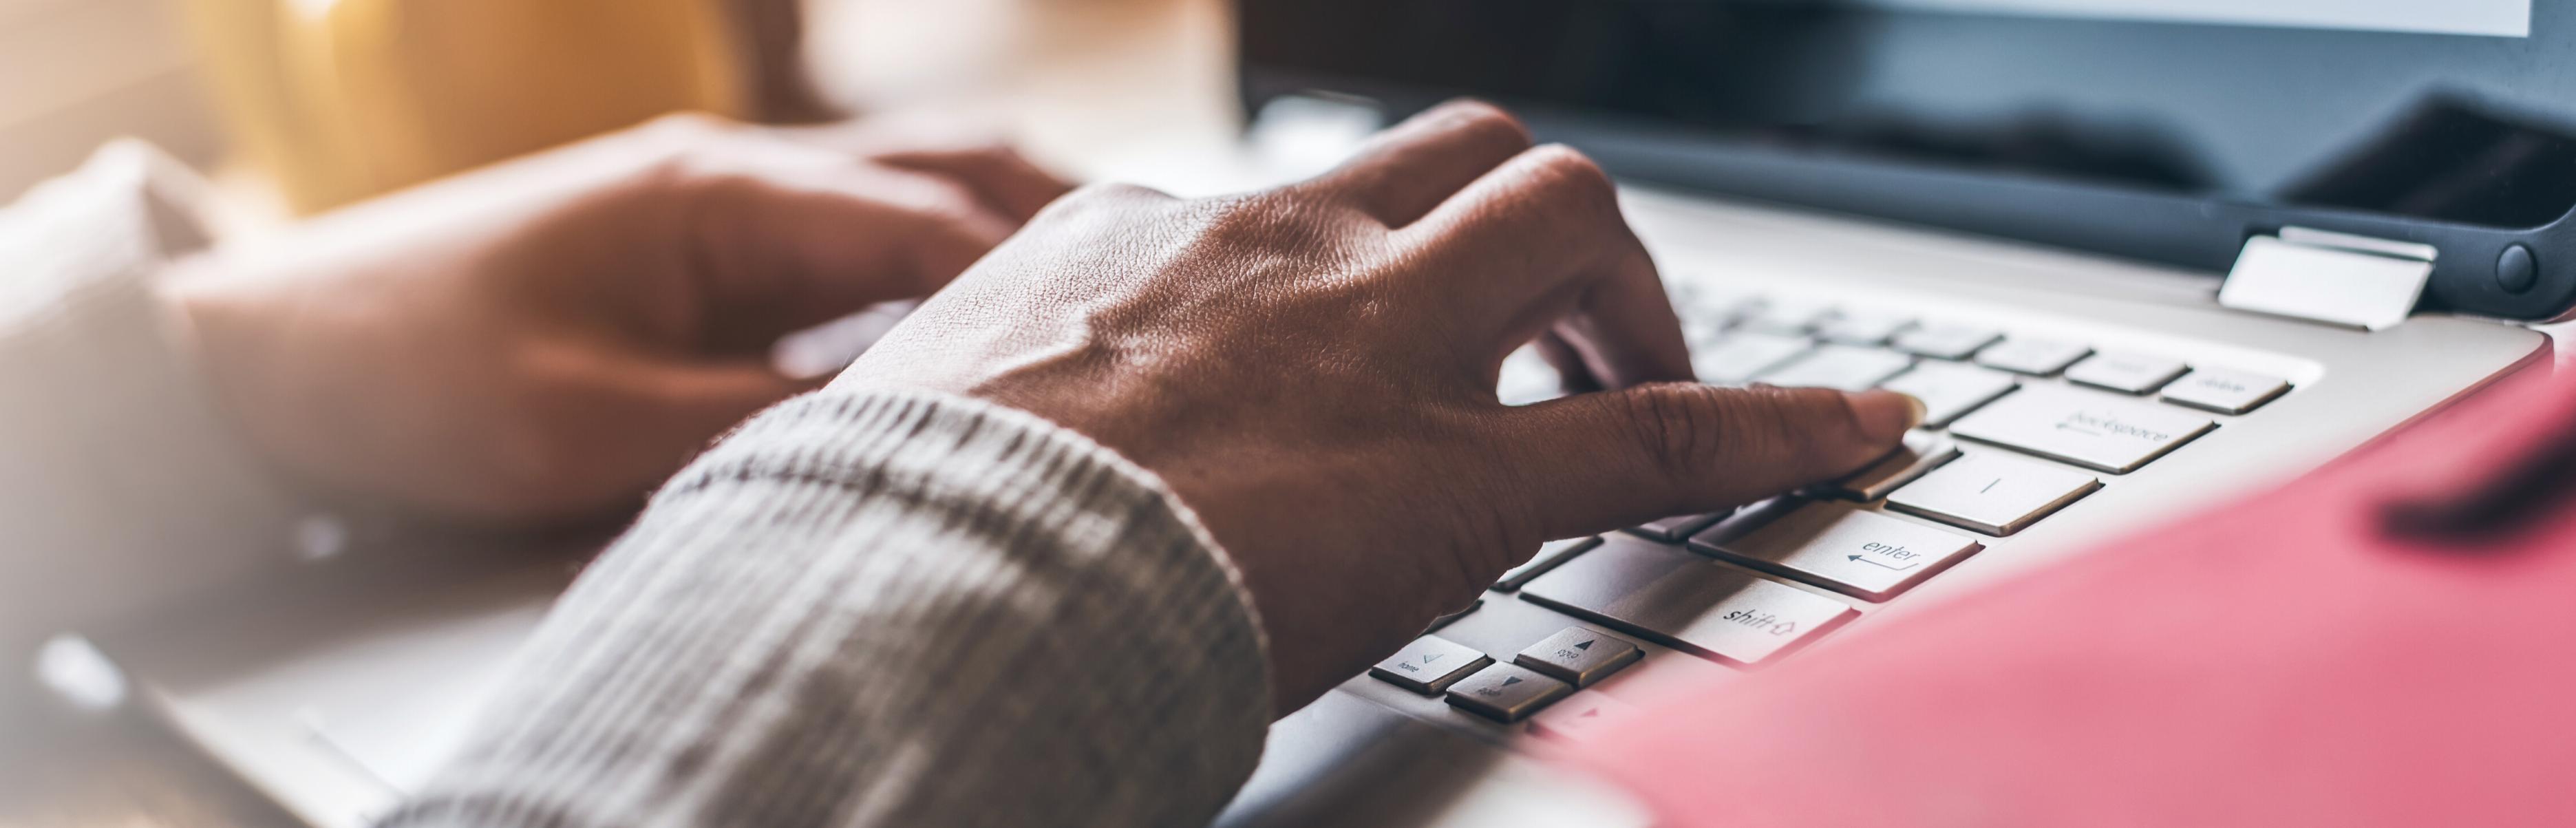 Woman Typing on Keyboard BOIPA